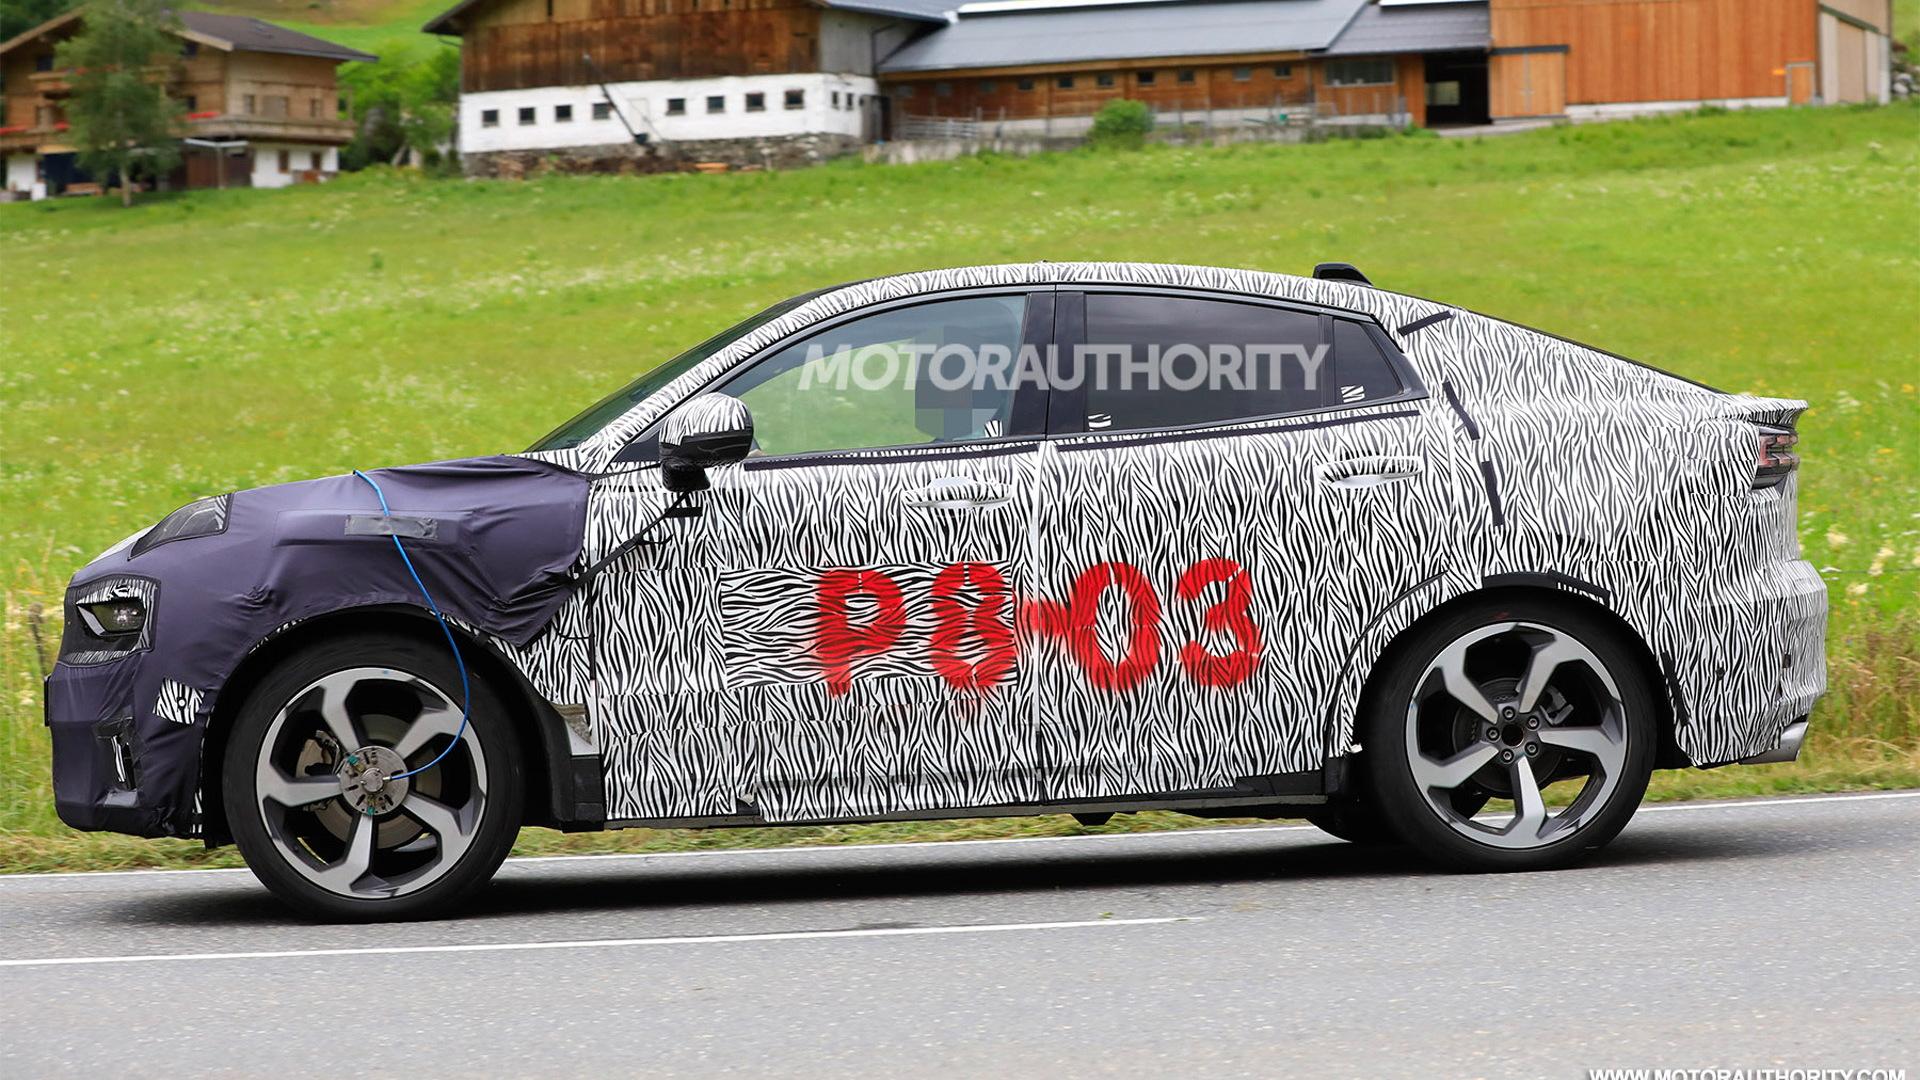 2020 Lynk & Co. 05 spy shots - Image via S. Baldauf/SB-Medien